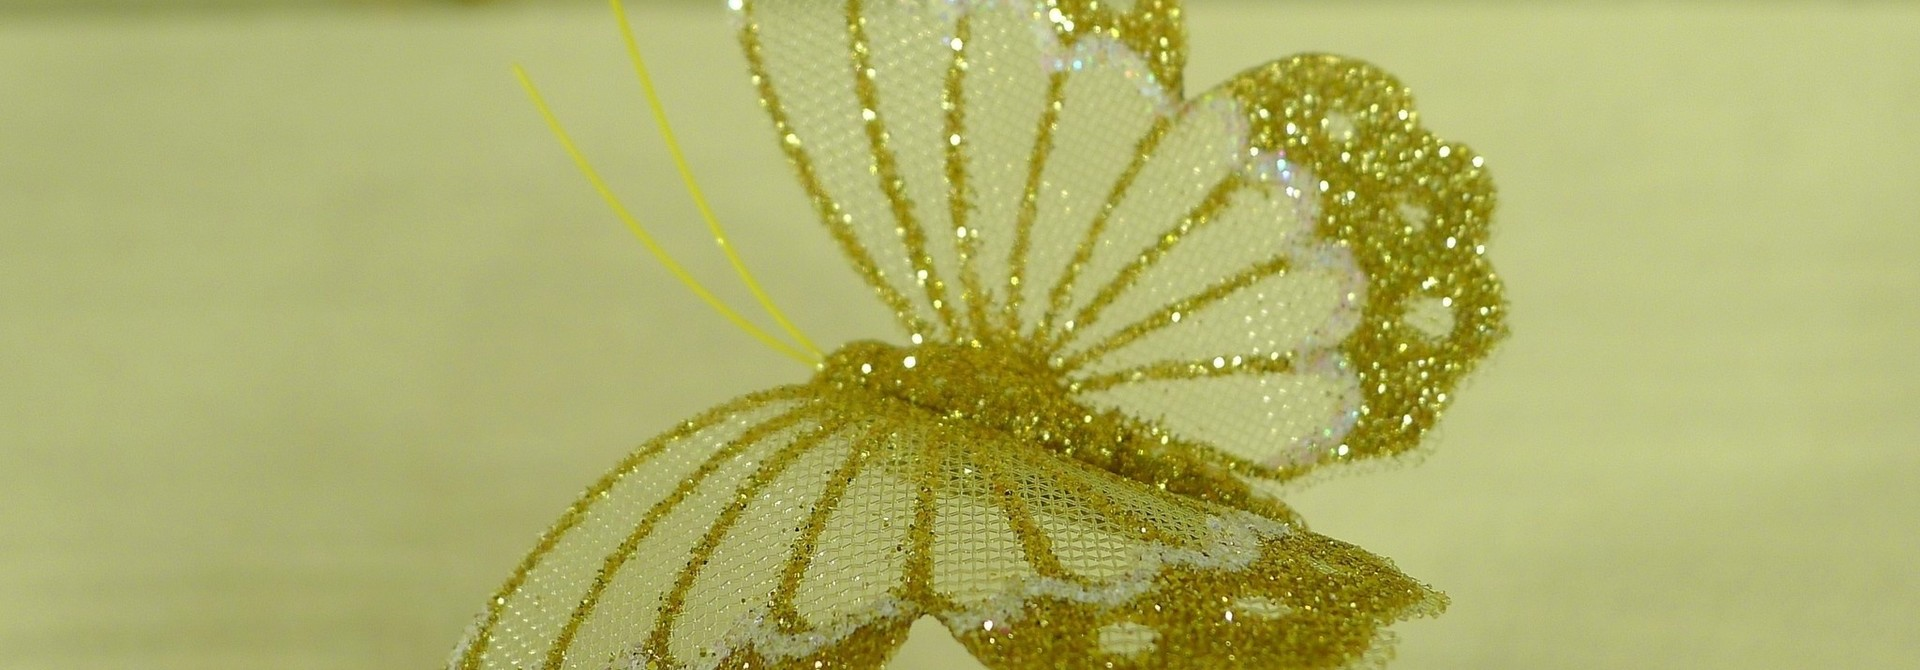 flor dec fabric butterfly 7.5 gold